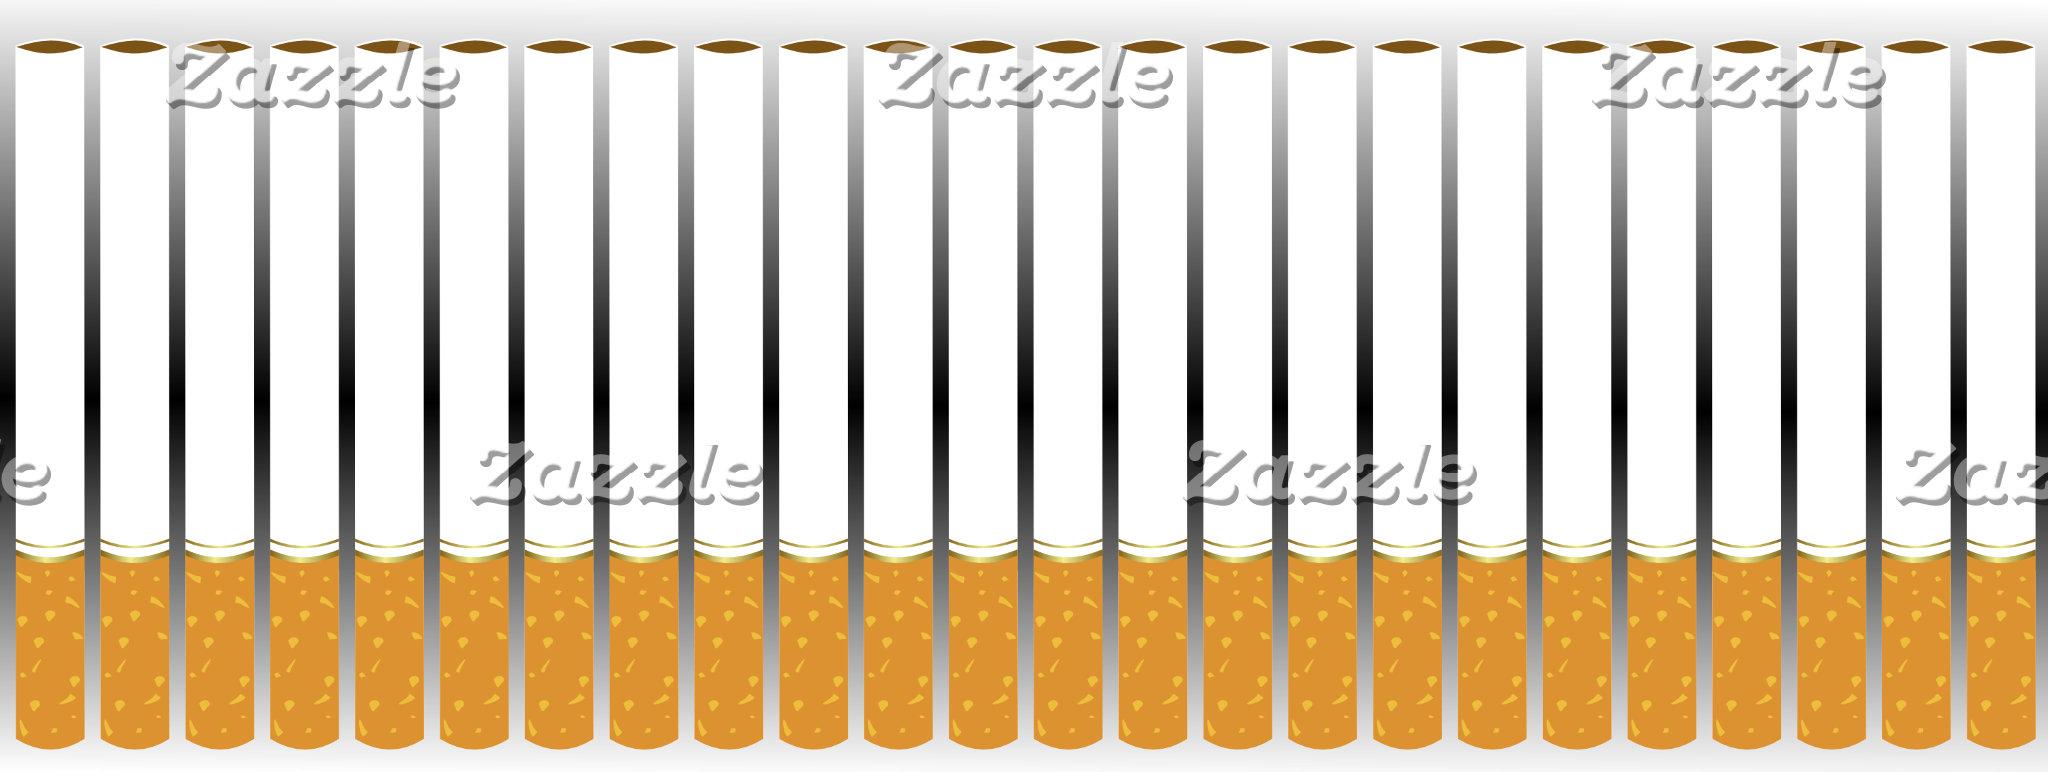 Smoking section